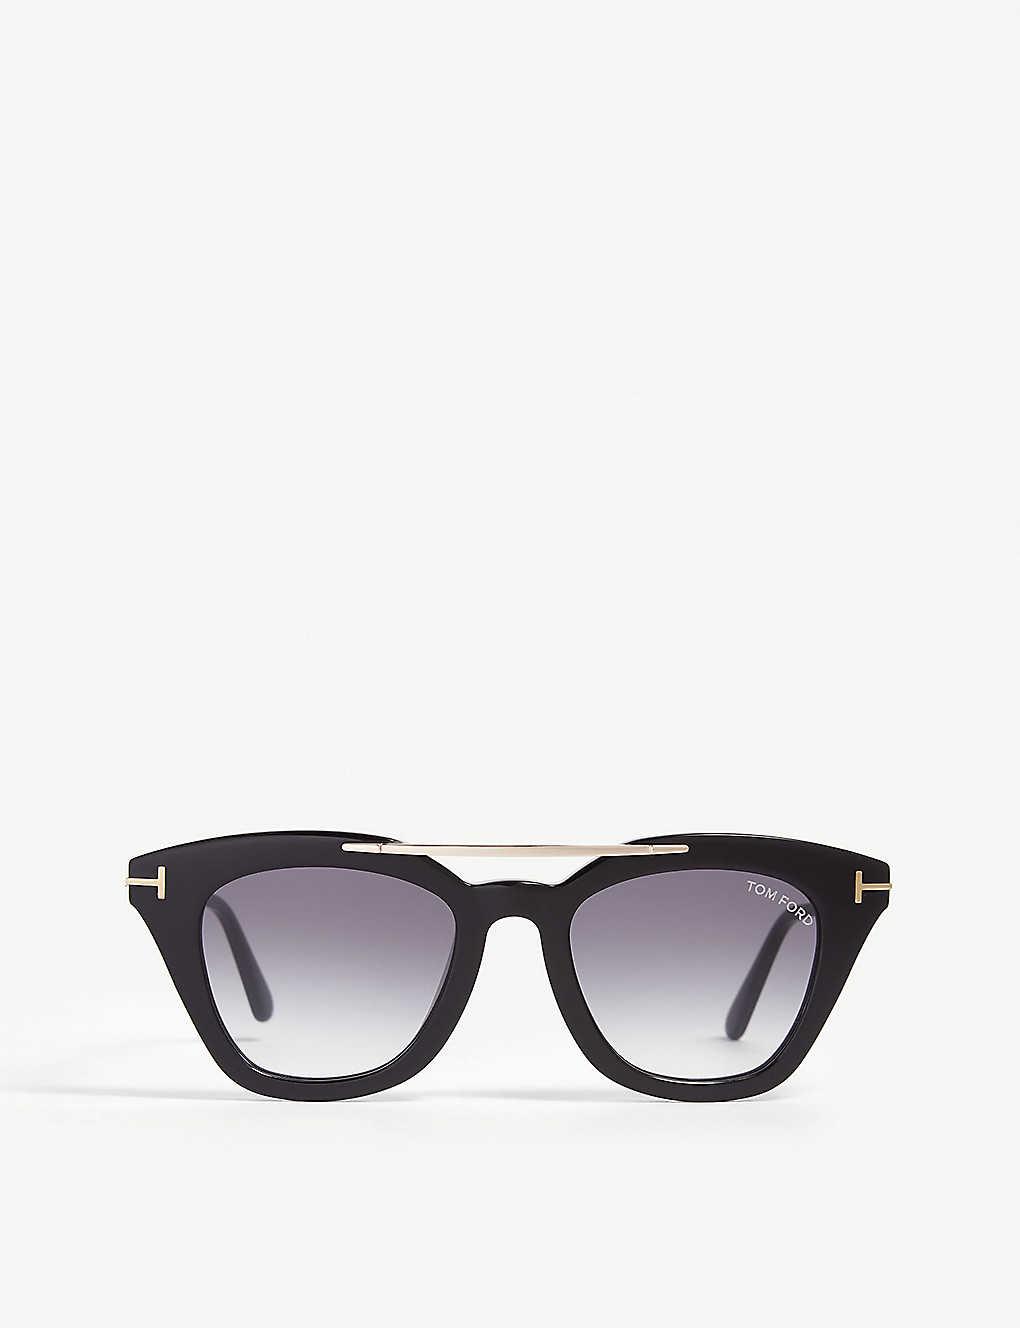 2e5f80afb49e4 TOM FORD - Anna-02 TF575 cat-eye-frame sunglasses